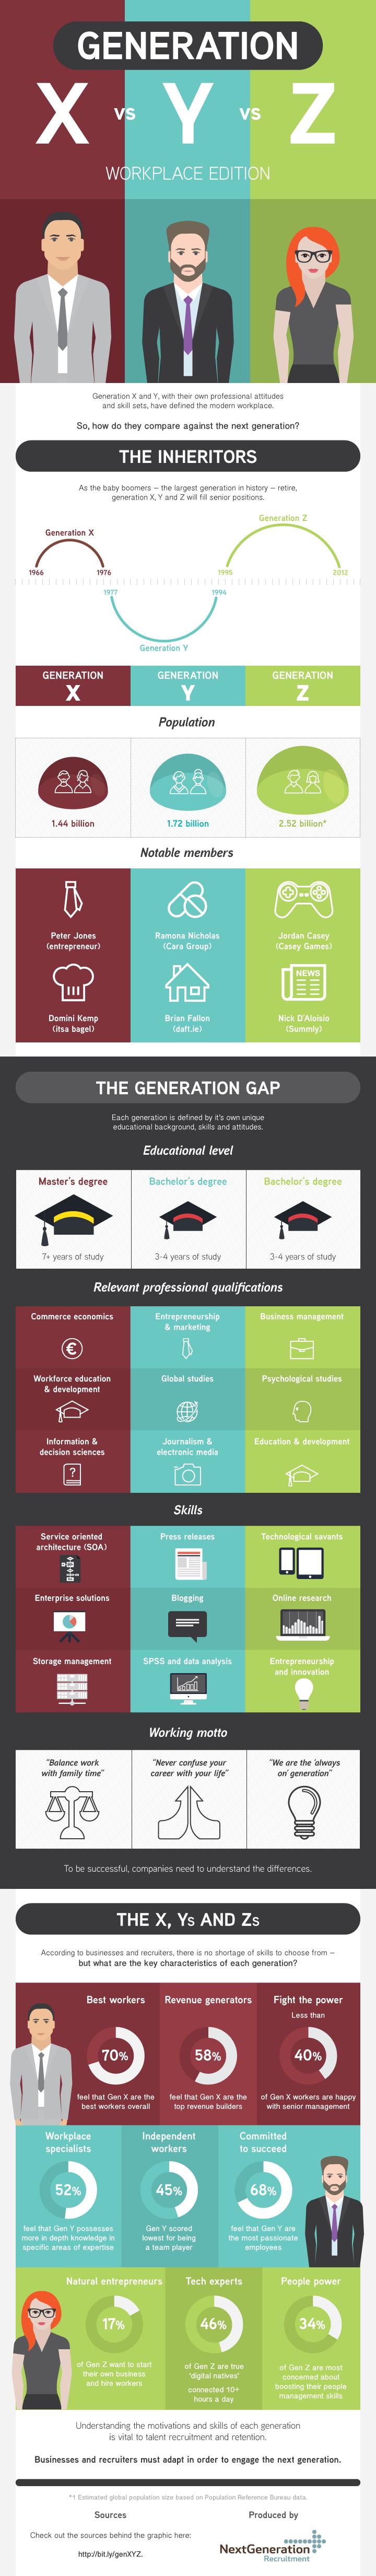 Generation Z Characteristics 5 Infographics On The Gen Z Lifestyle Generation Z Infographic Leadership